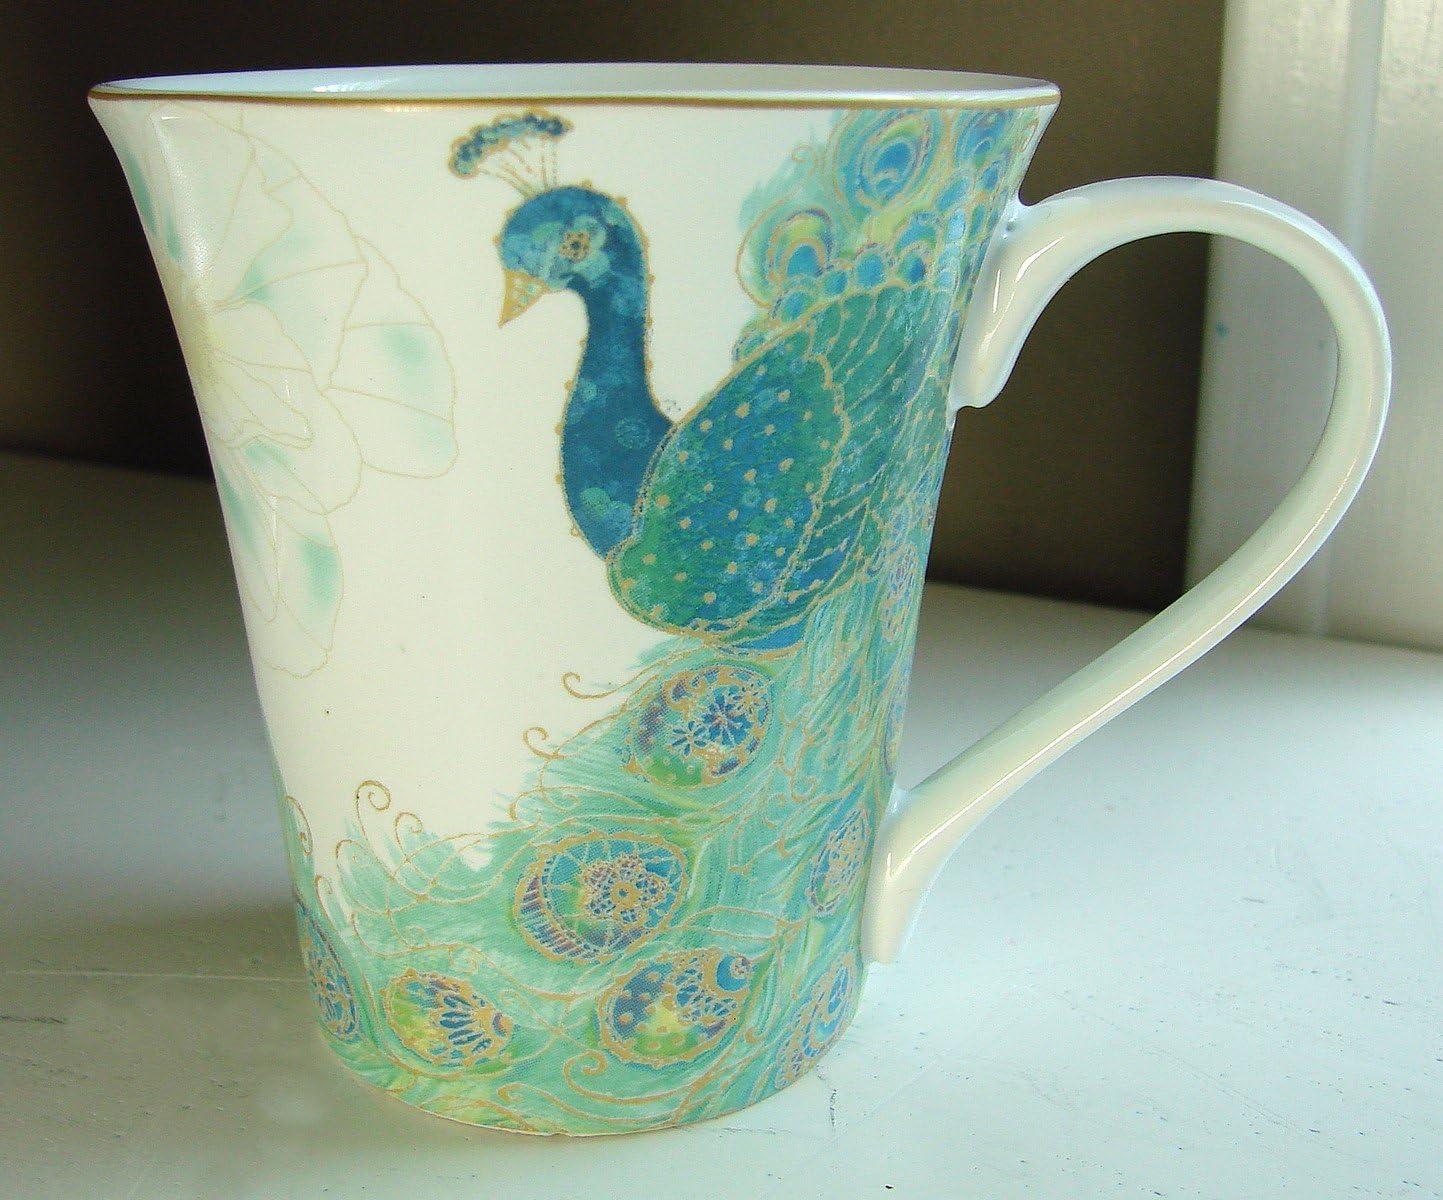 222 Fifth Lakshmi Peacock Coffee Mugs, Set of 4